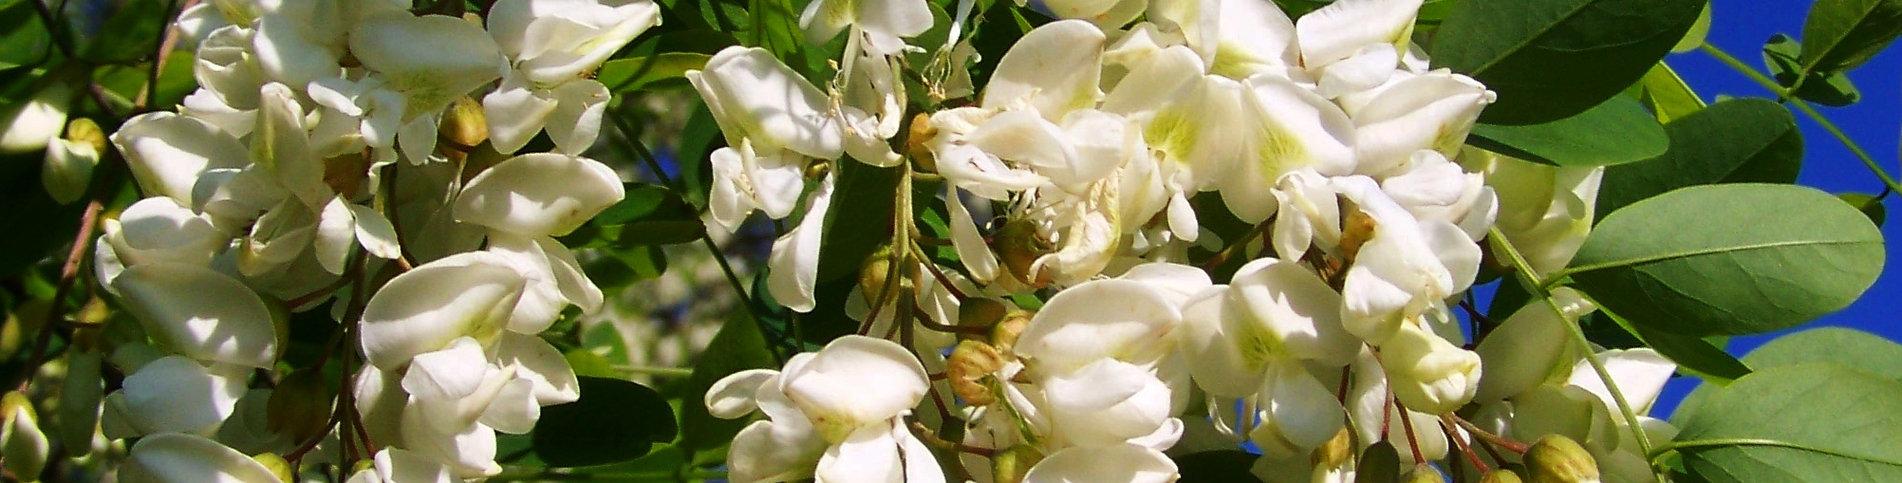 branch-blossom-plant-flower-spring-produ